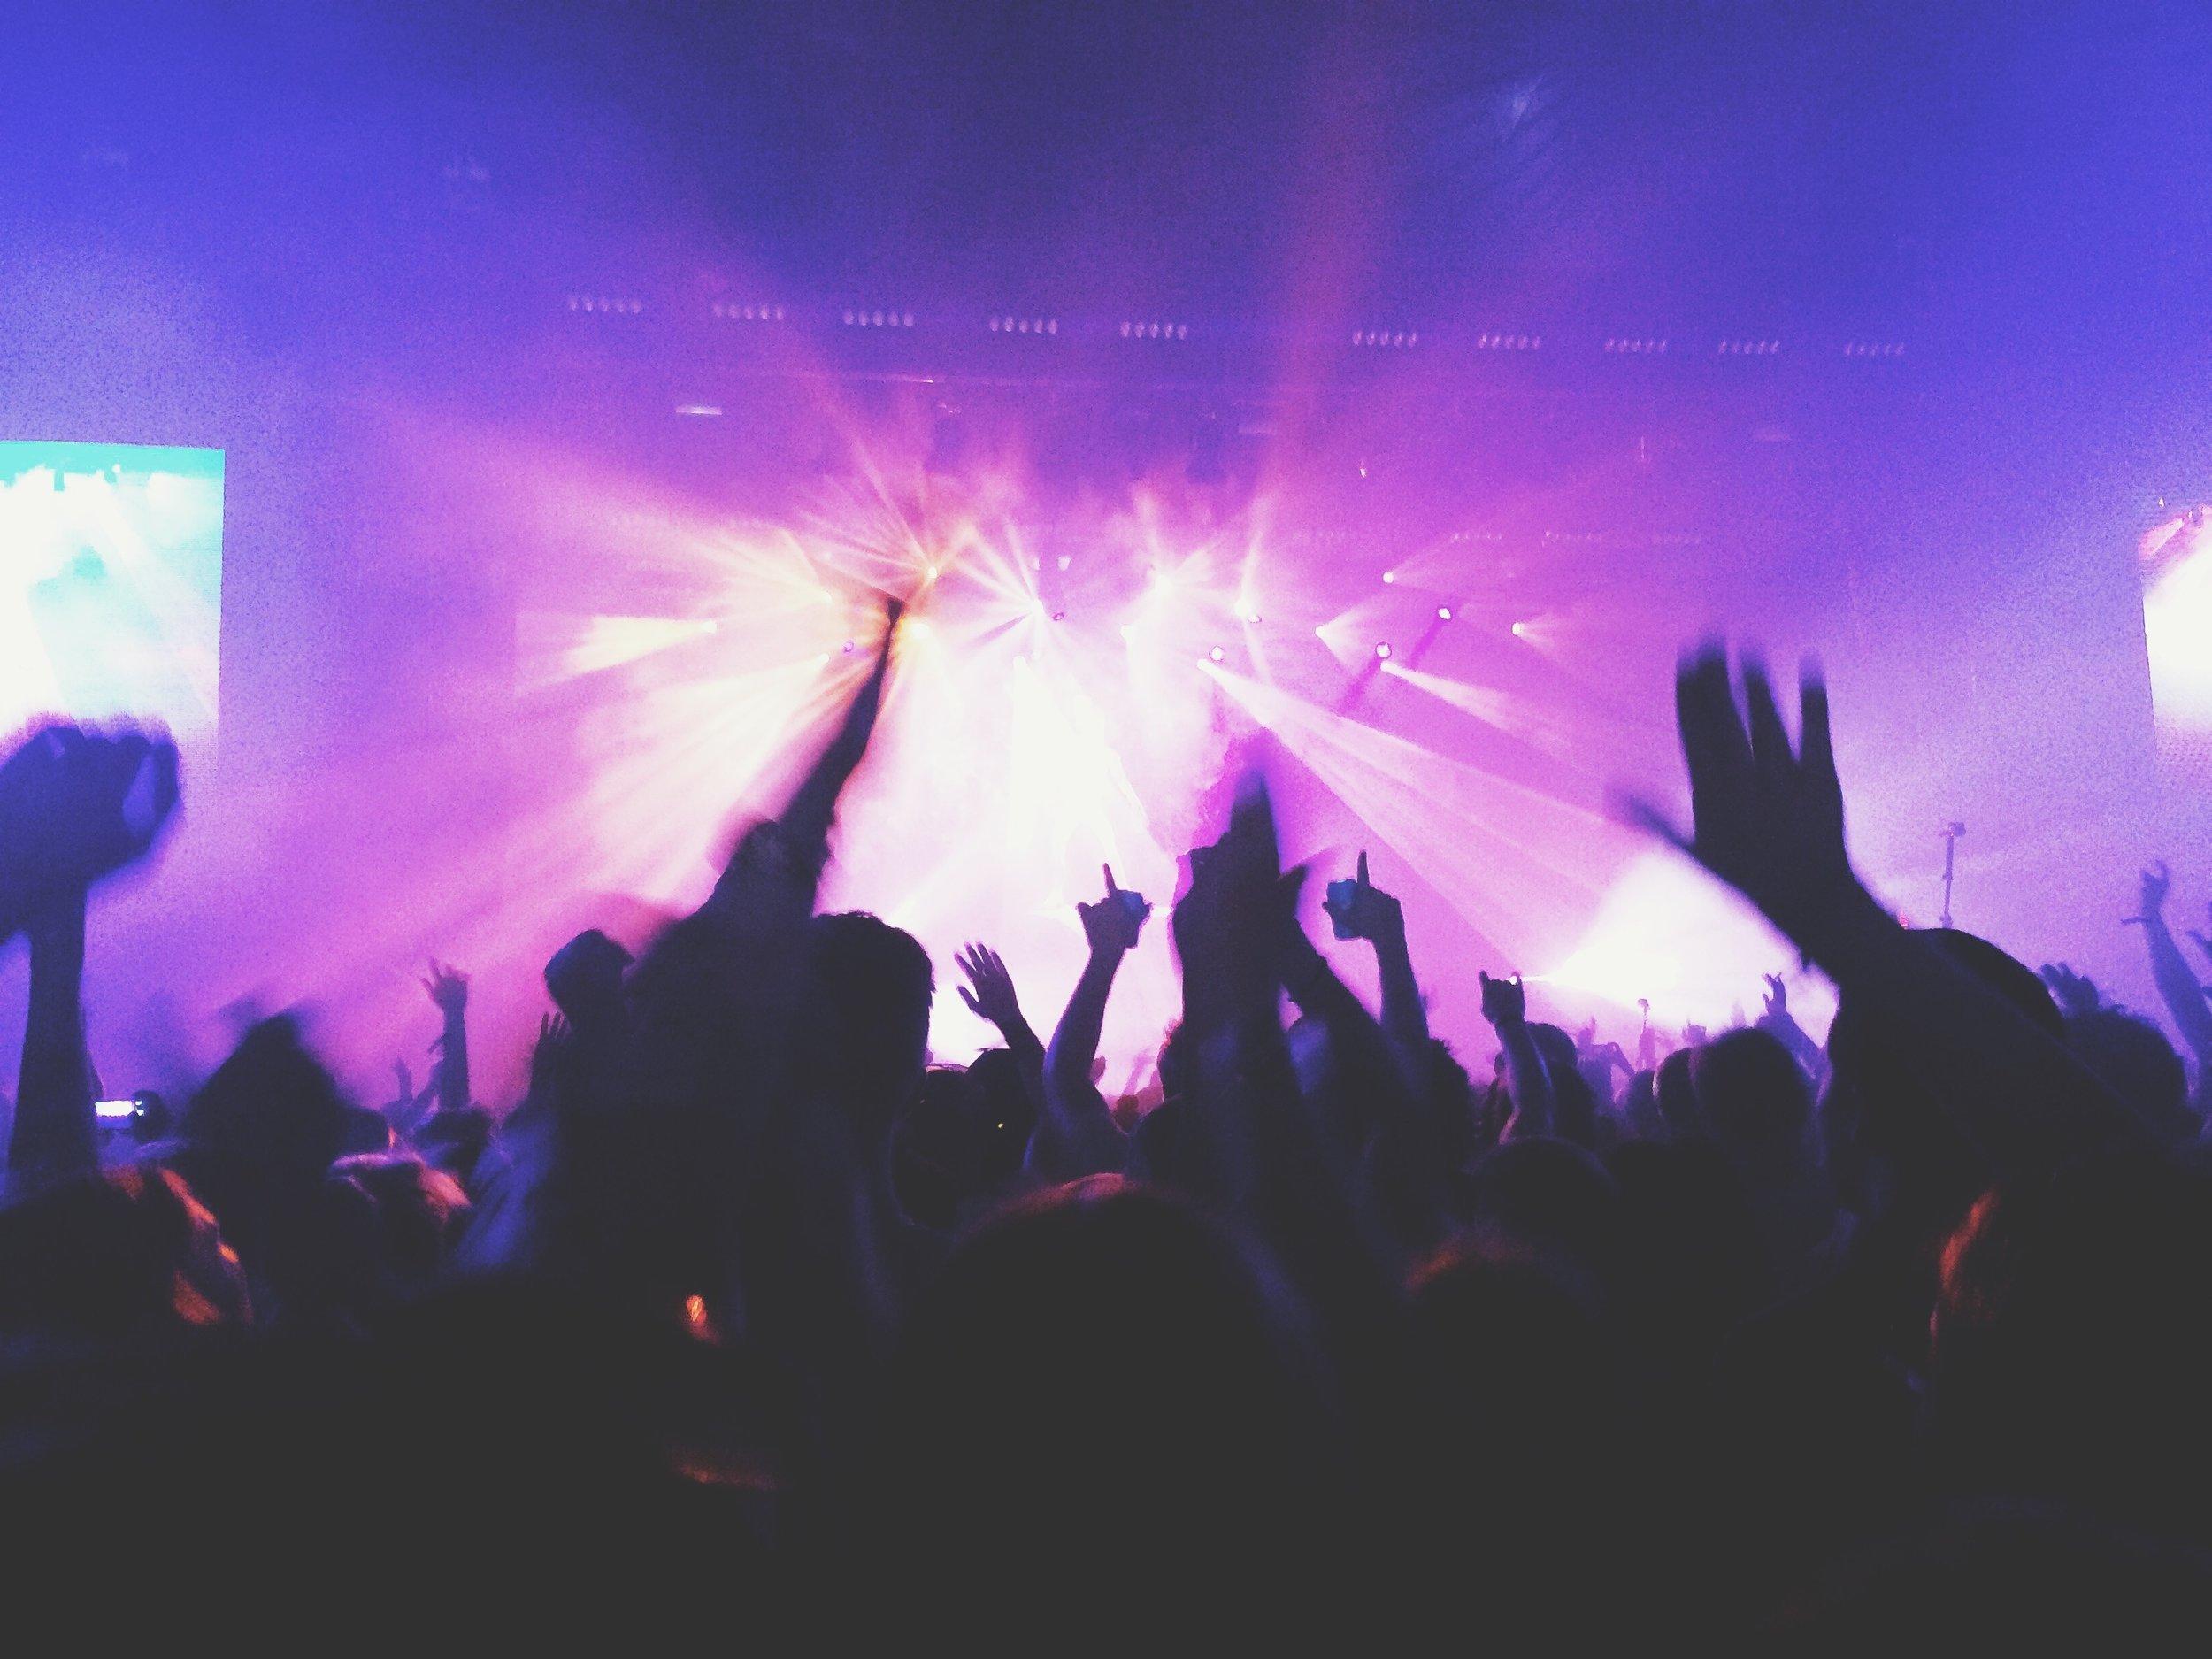 concert-1149979.jpg